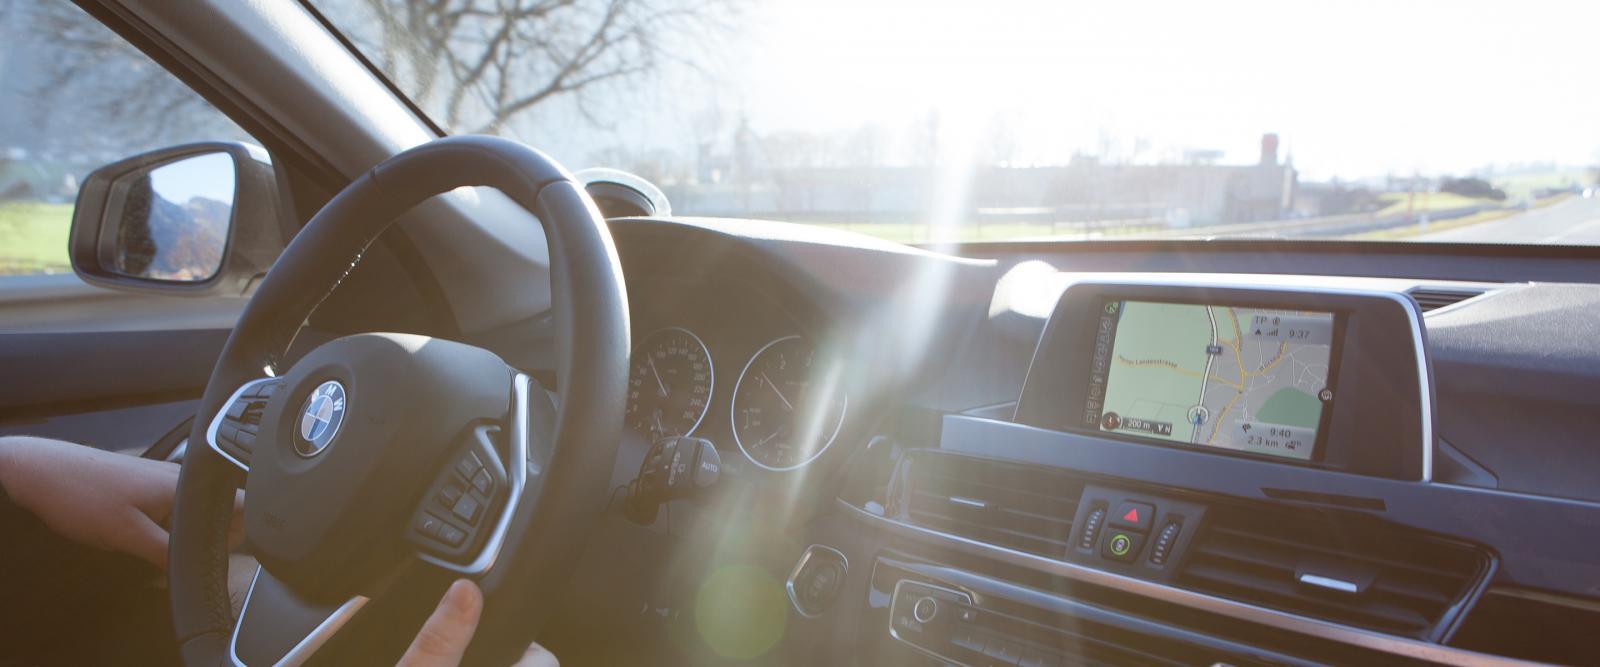 drivenow-carsharing-wien-miete-starten-beenden